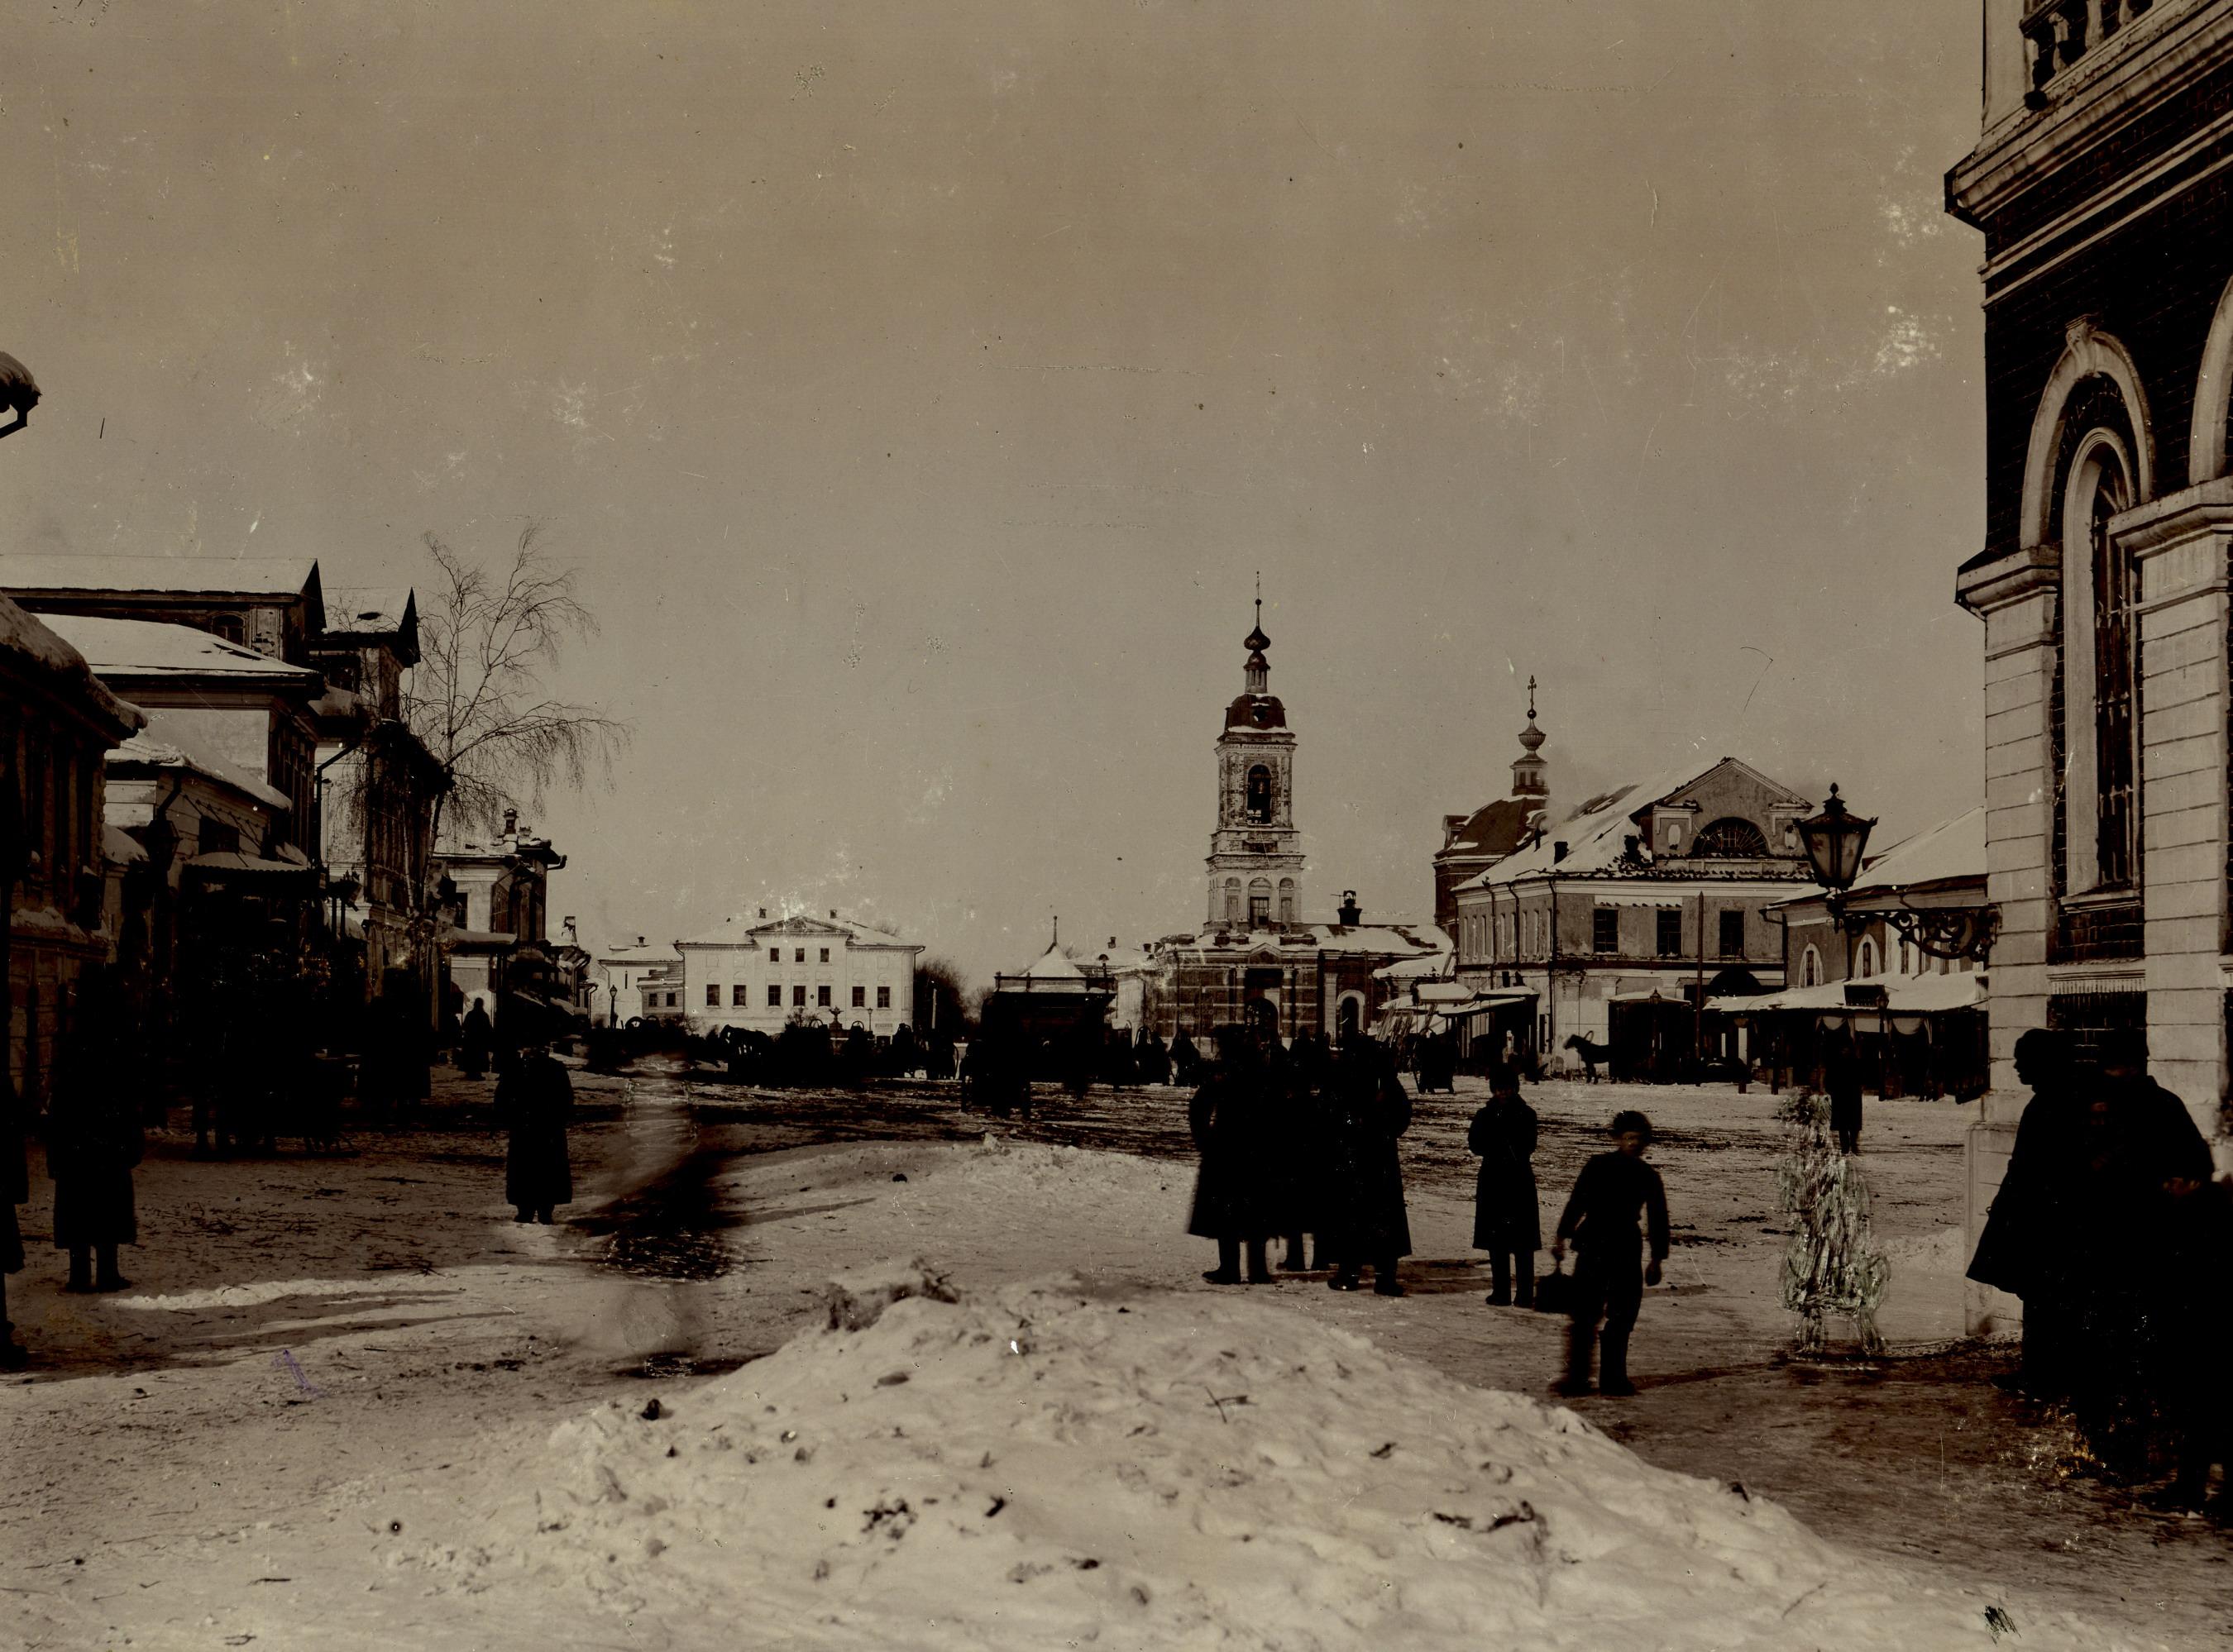 Рождественская улица. Водонапорная башня Ермакова.  1901